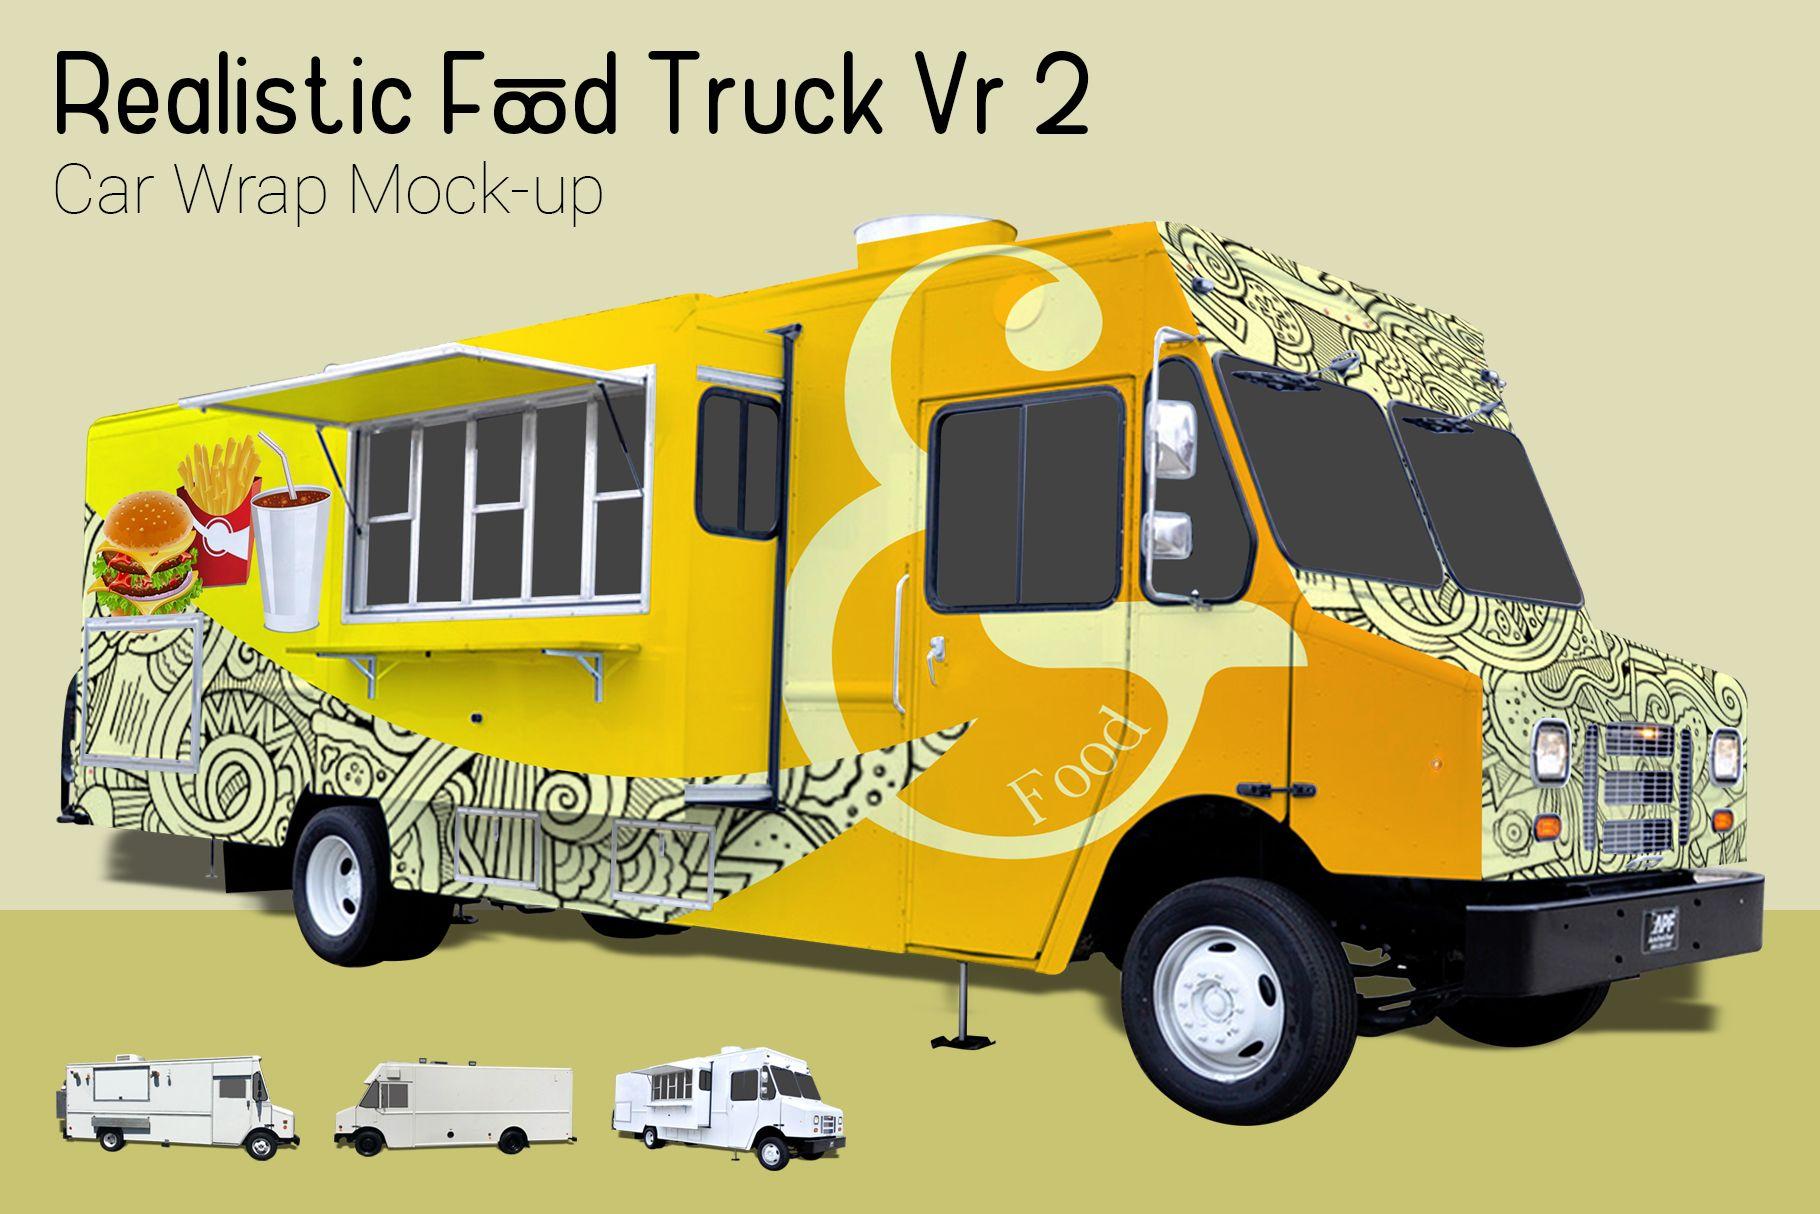 Food truck mockup graphic by gumacreative word art